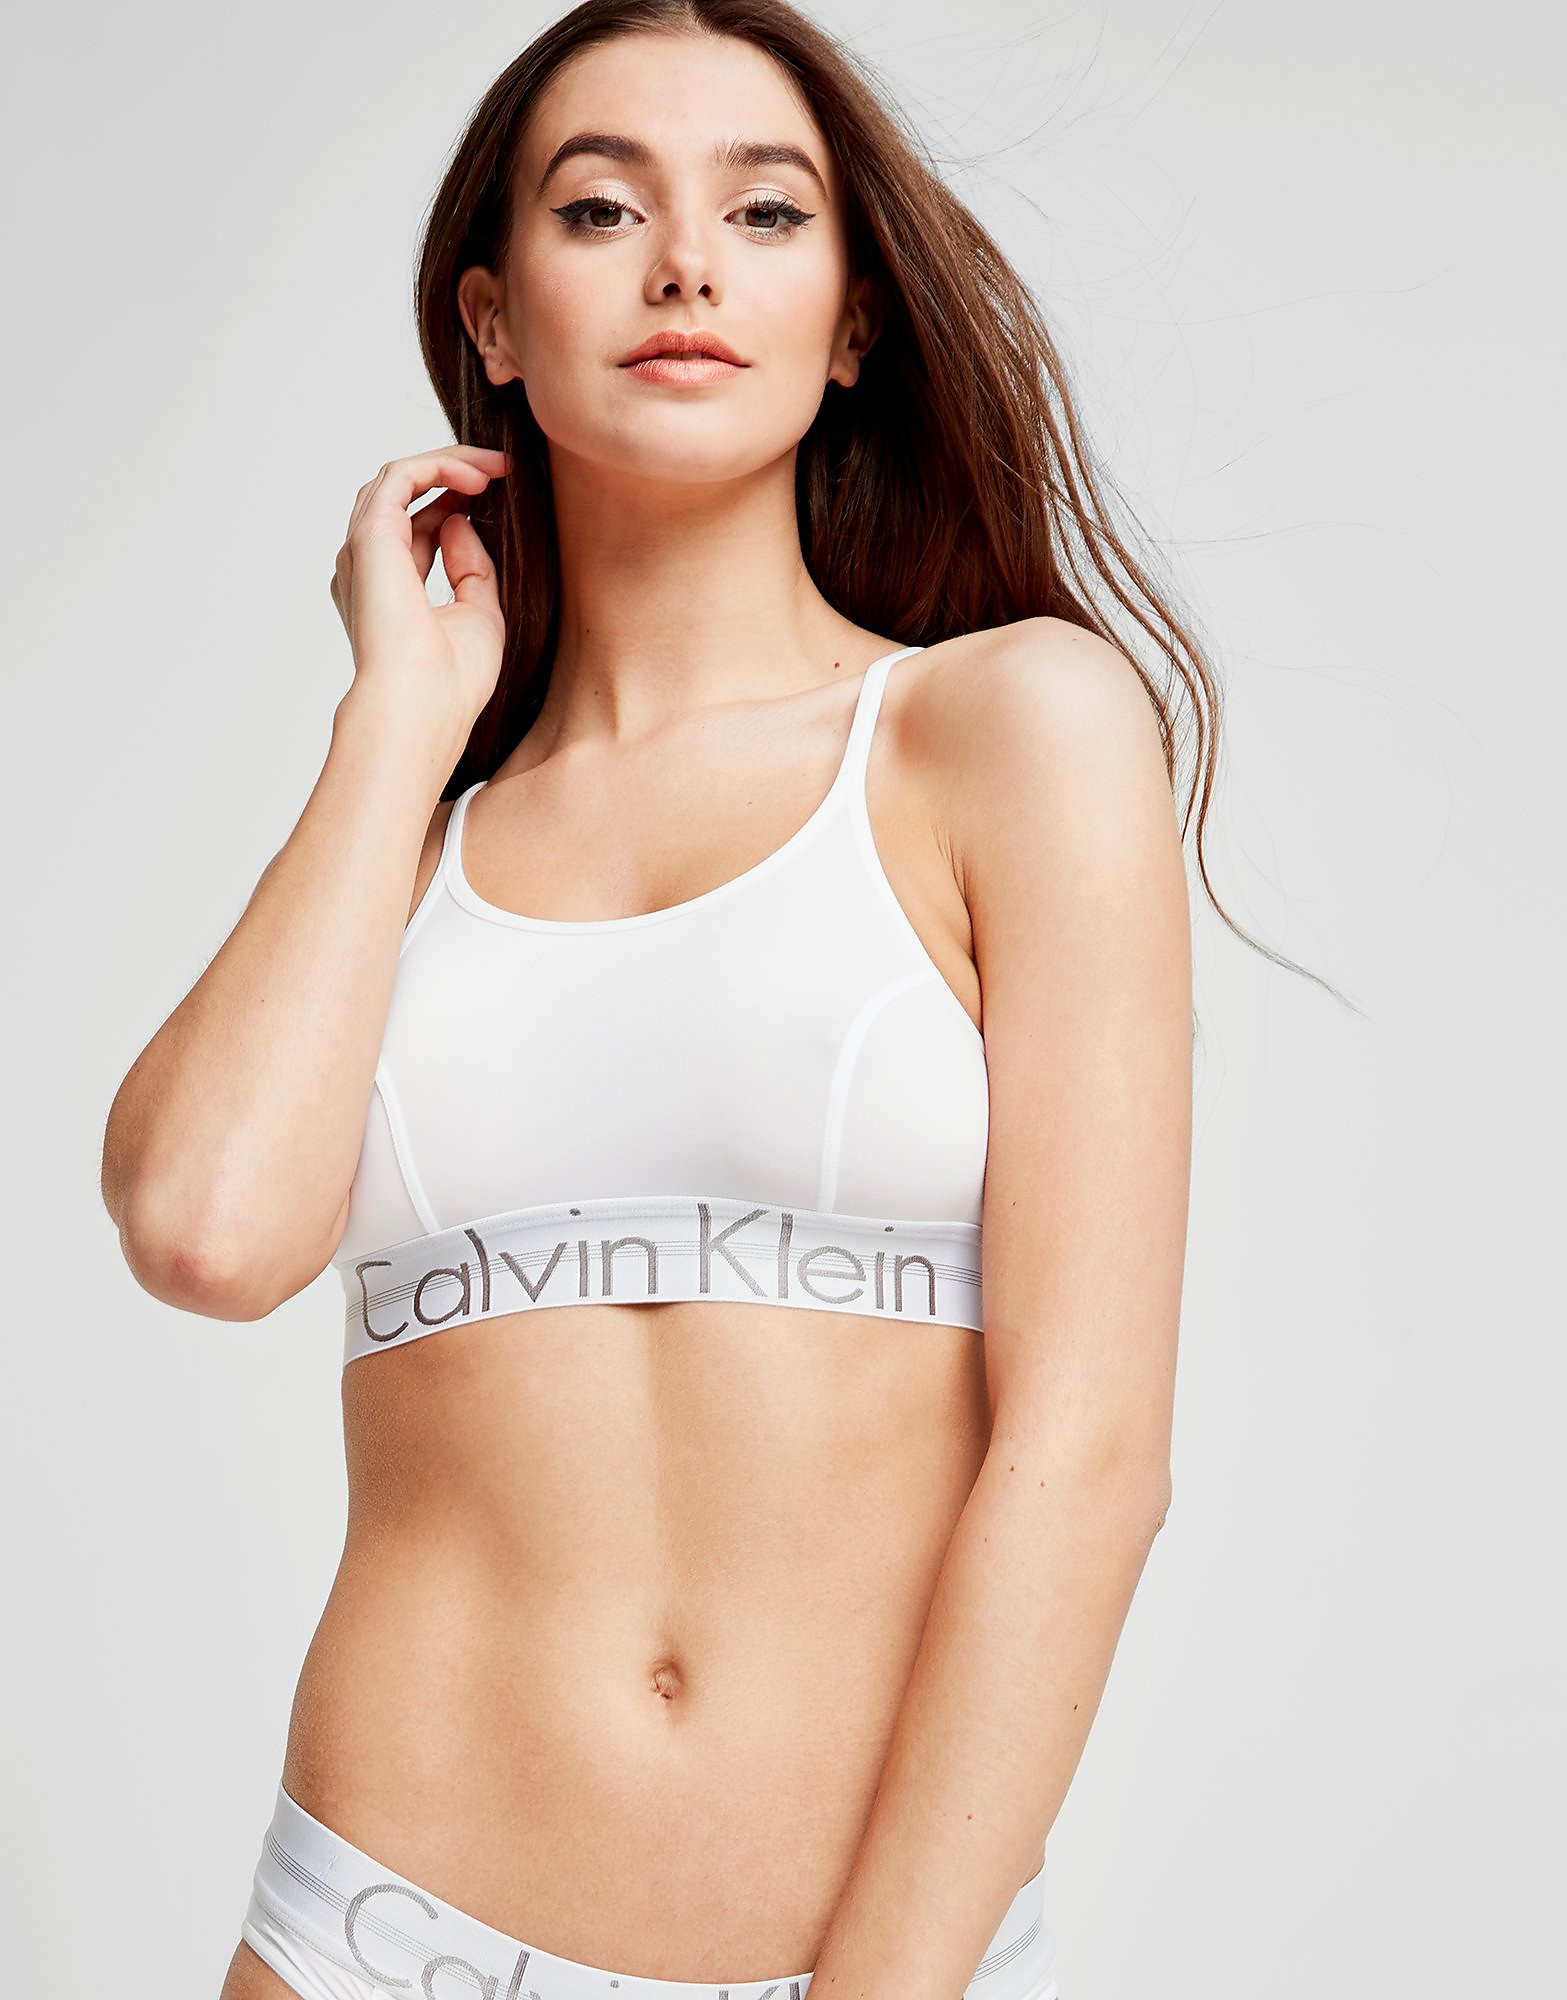 Calvin Klein Focused Fit Bra